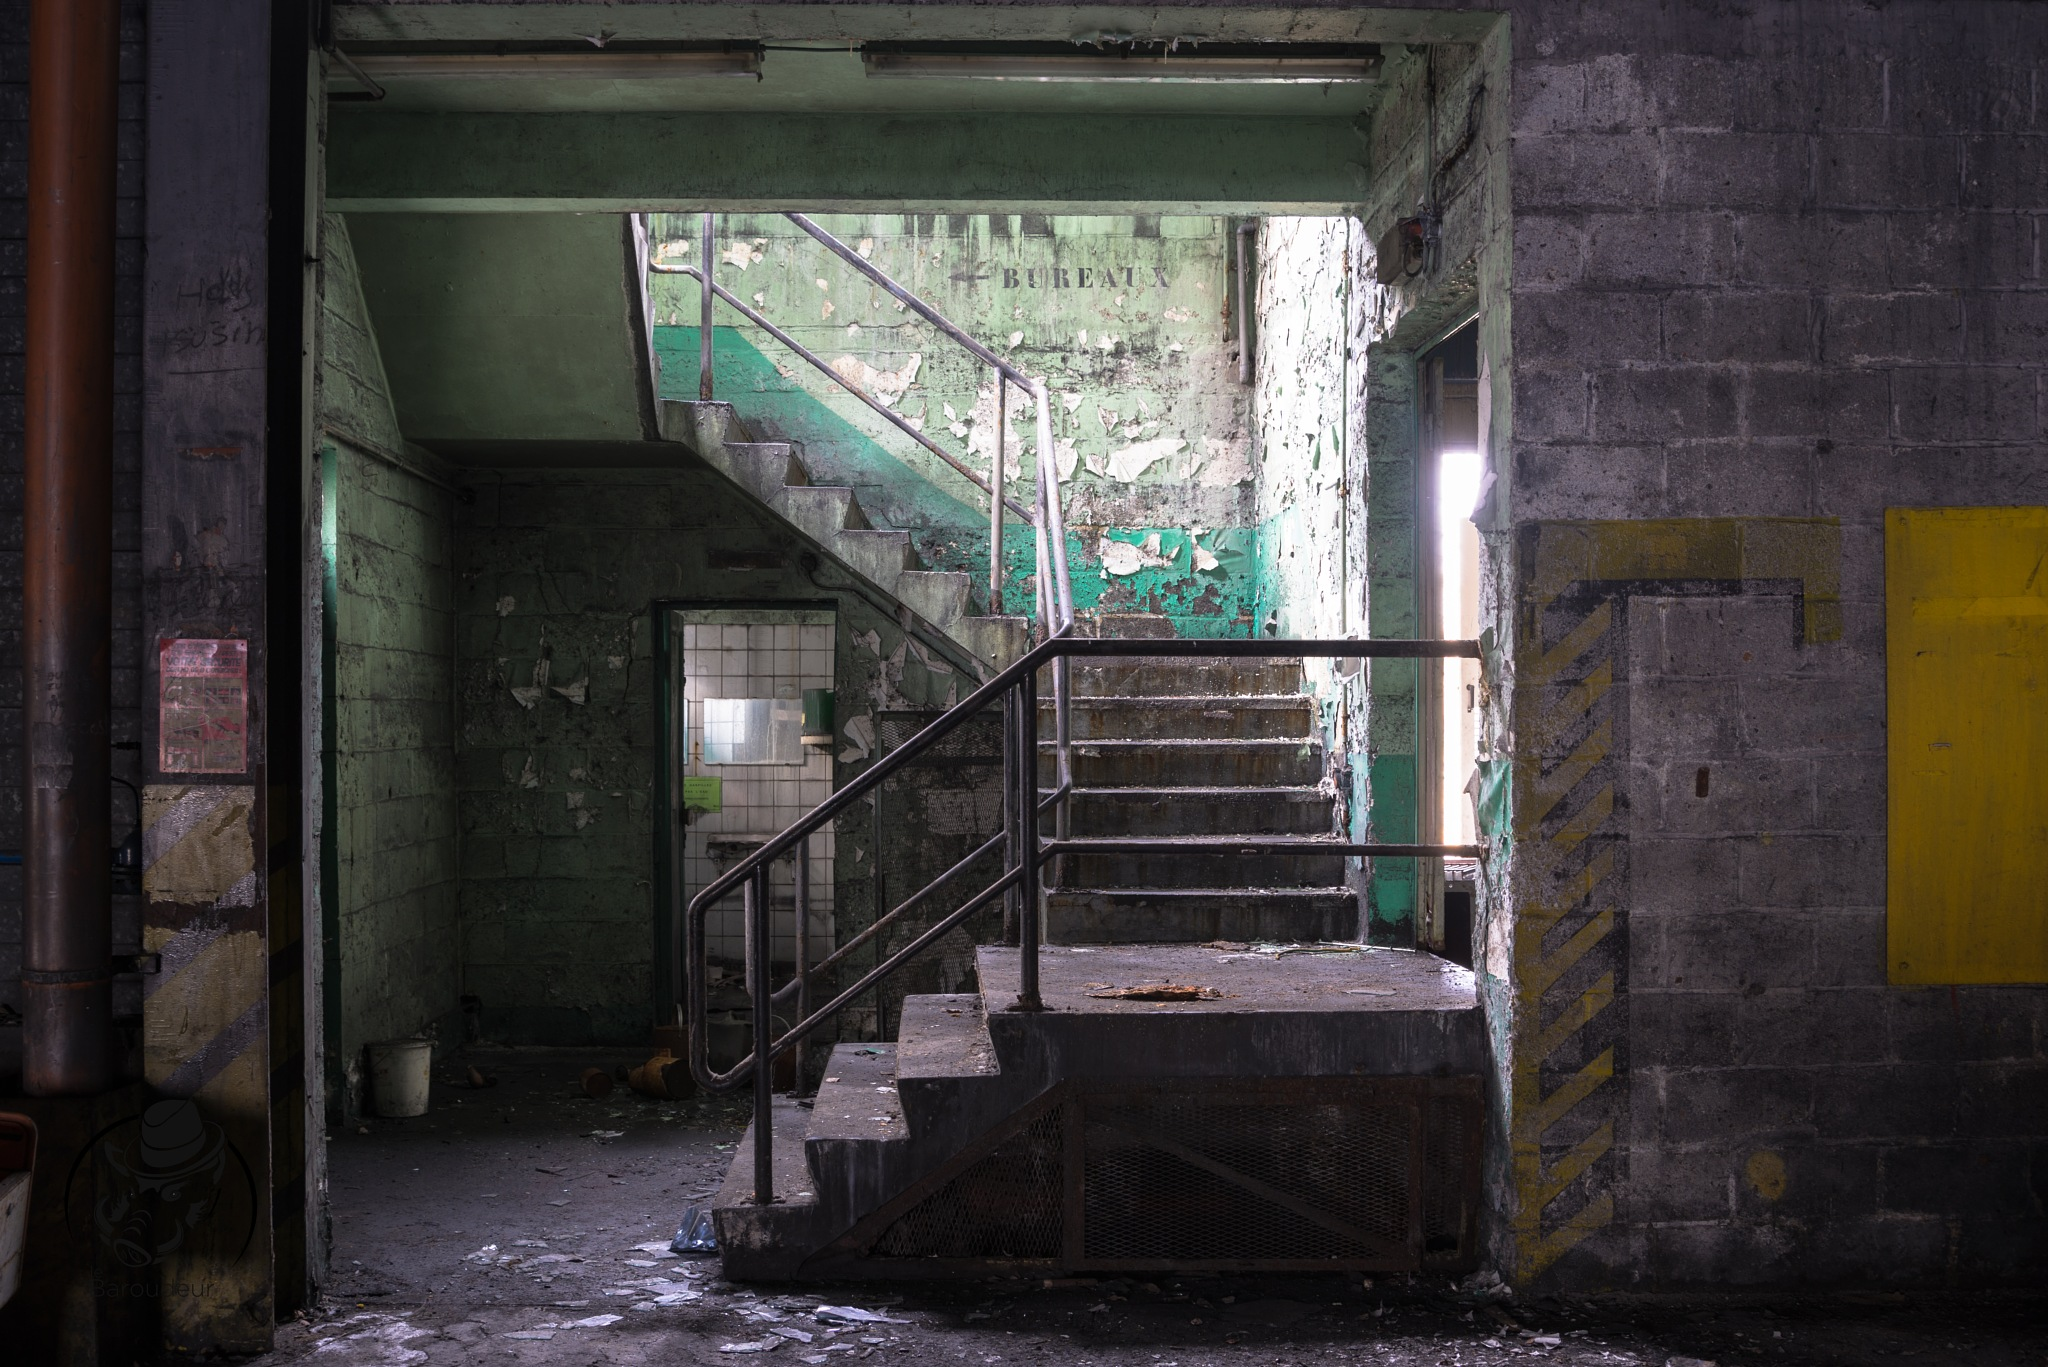 L'escalier de la gloire by Le Baroudeur